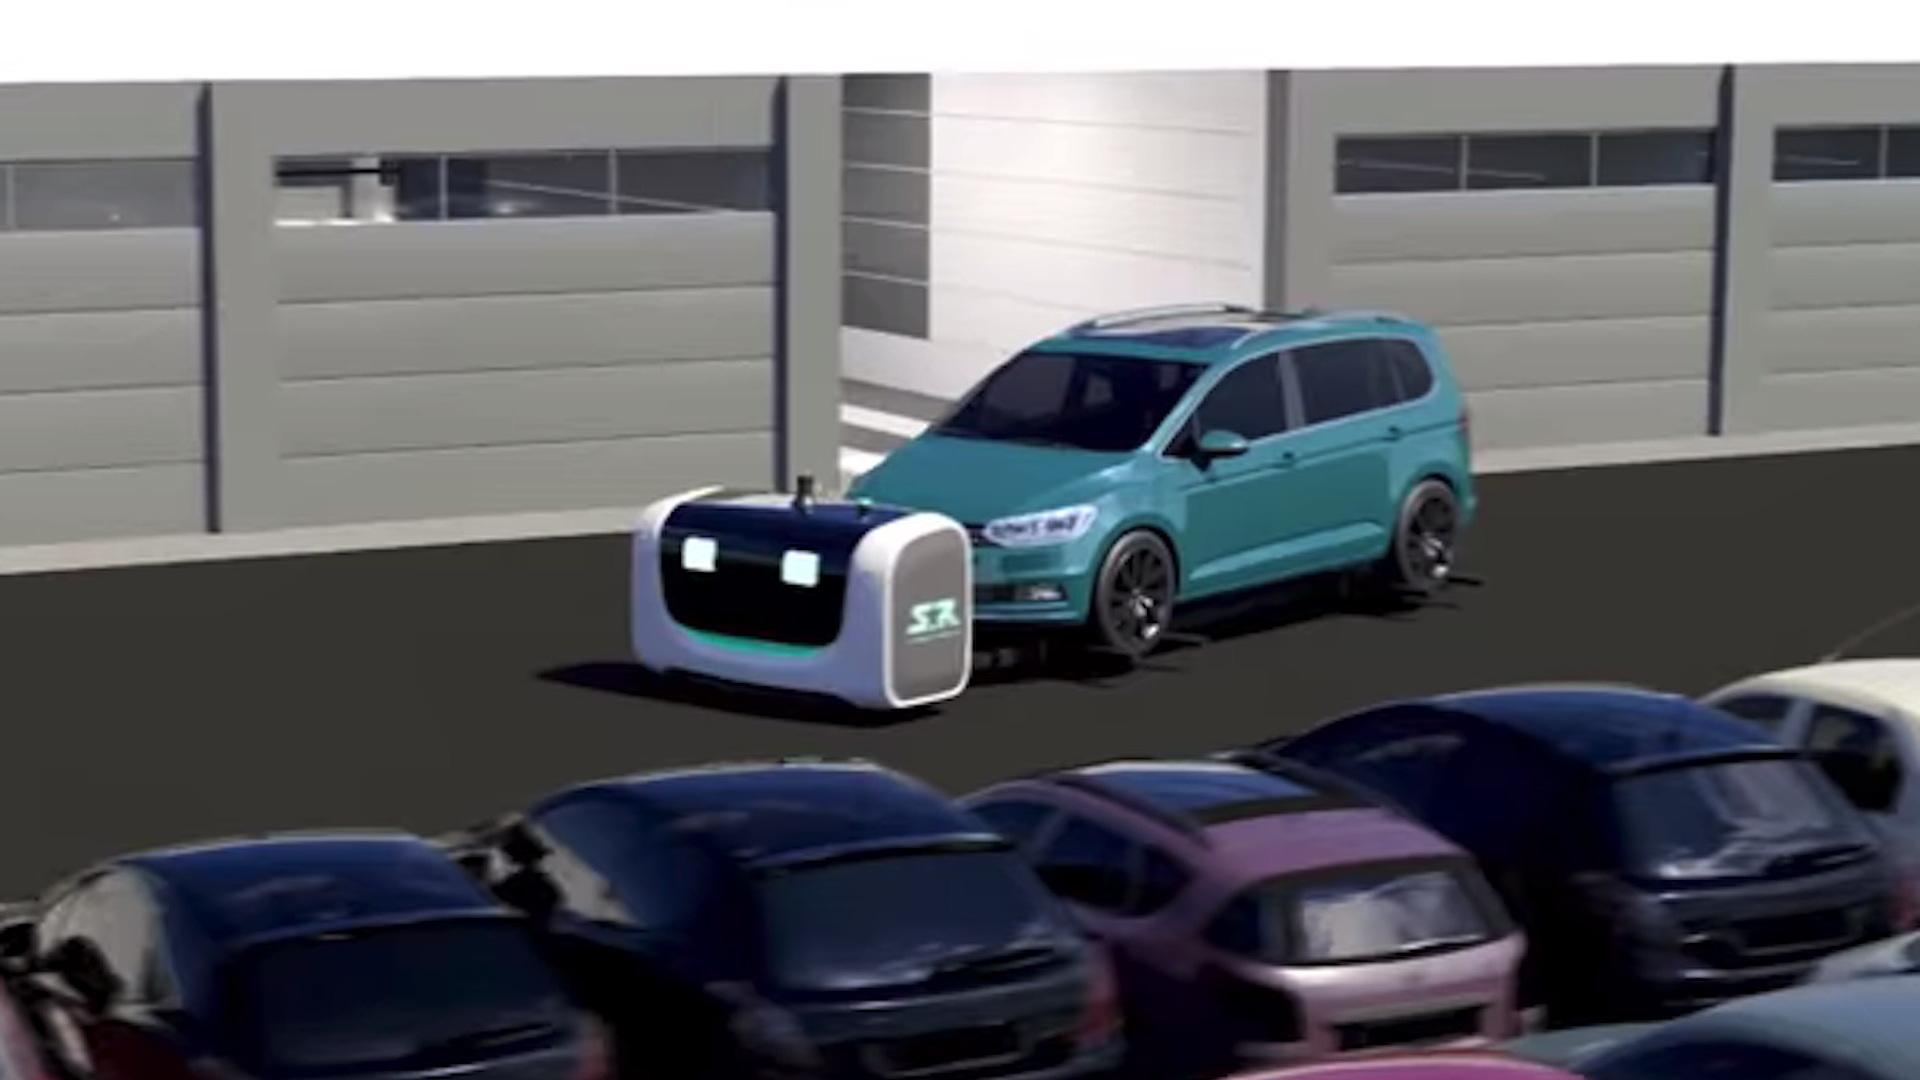 Stanley Robotics car parking robots